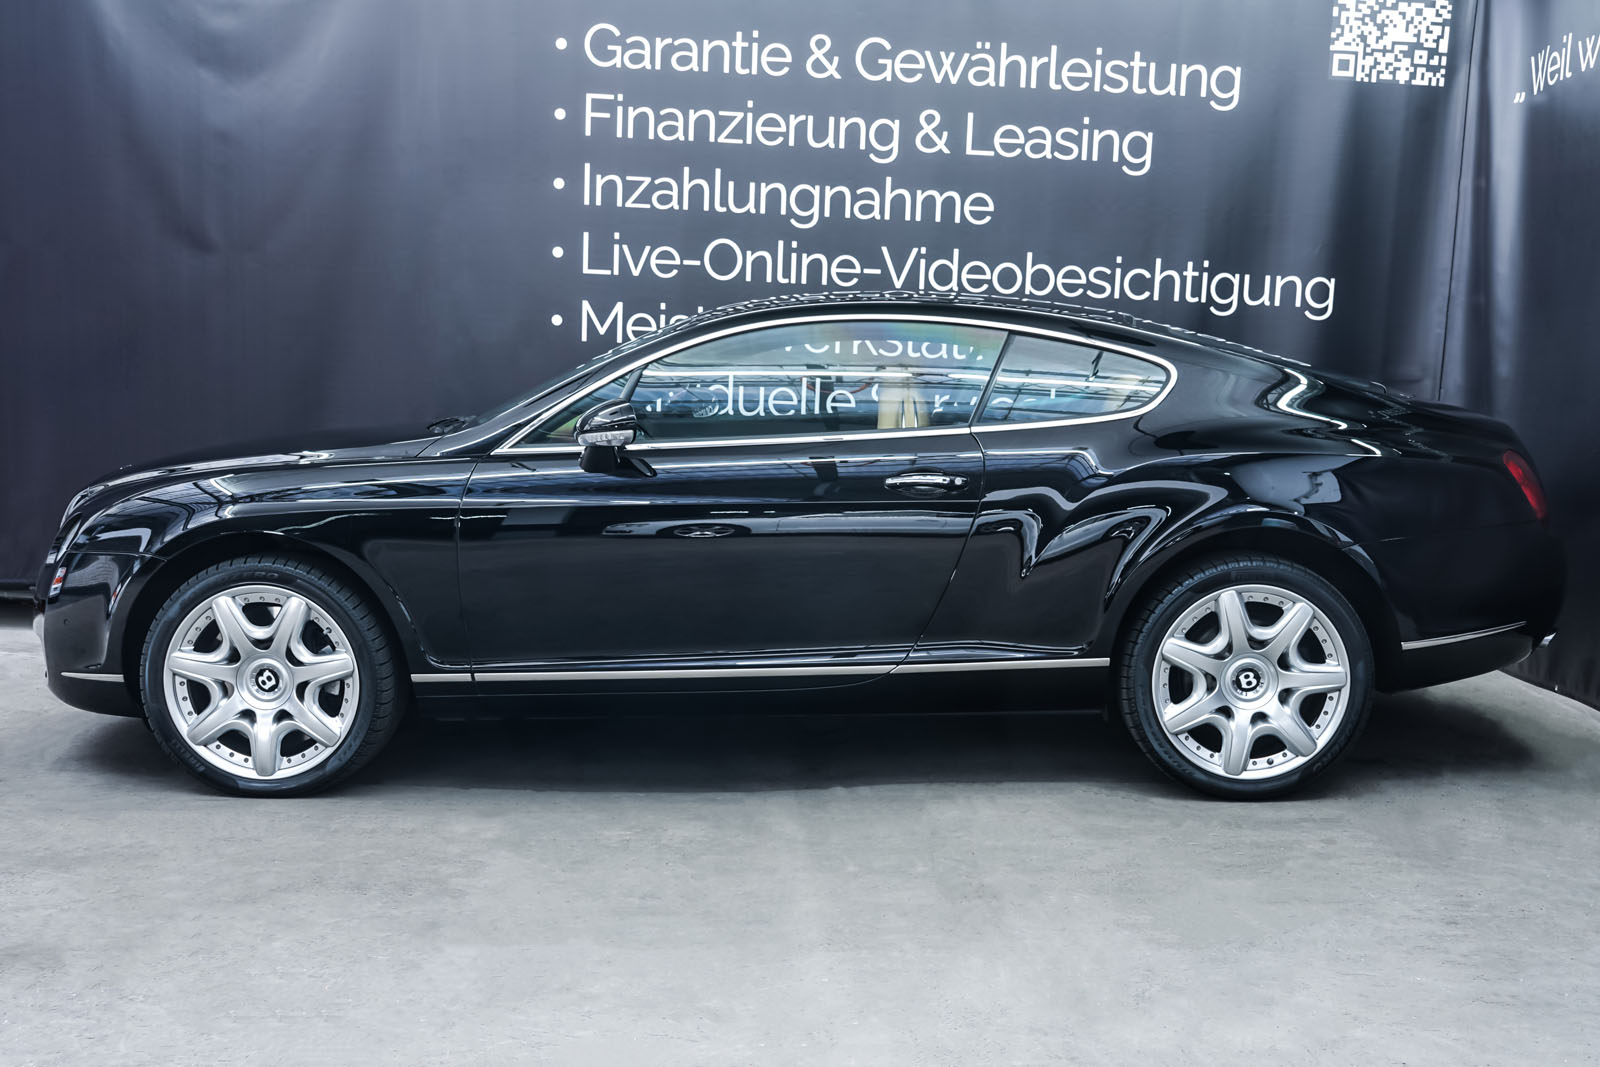 Bentley_Continental_GT_Schwarz_Beige_BEN-1159_5_w